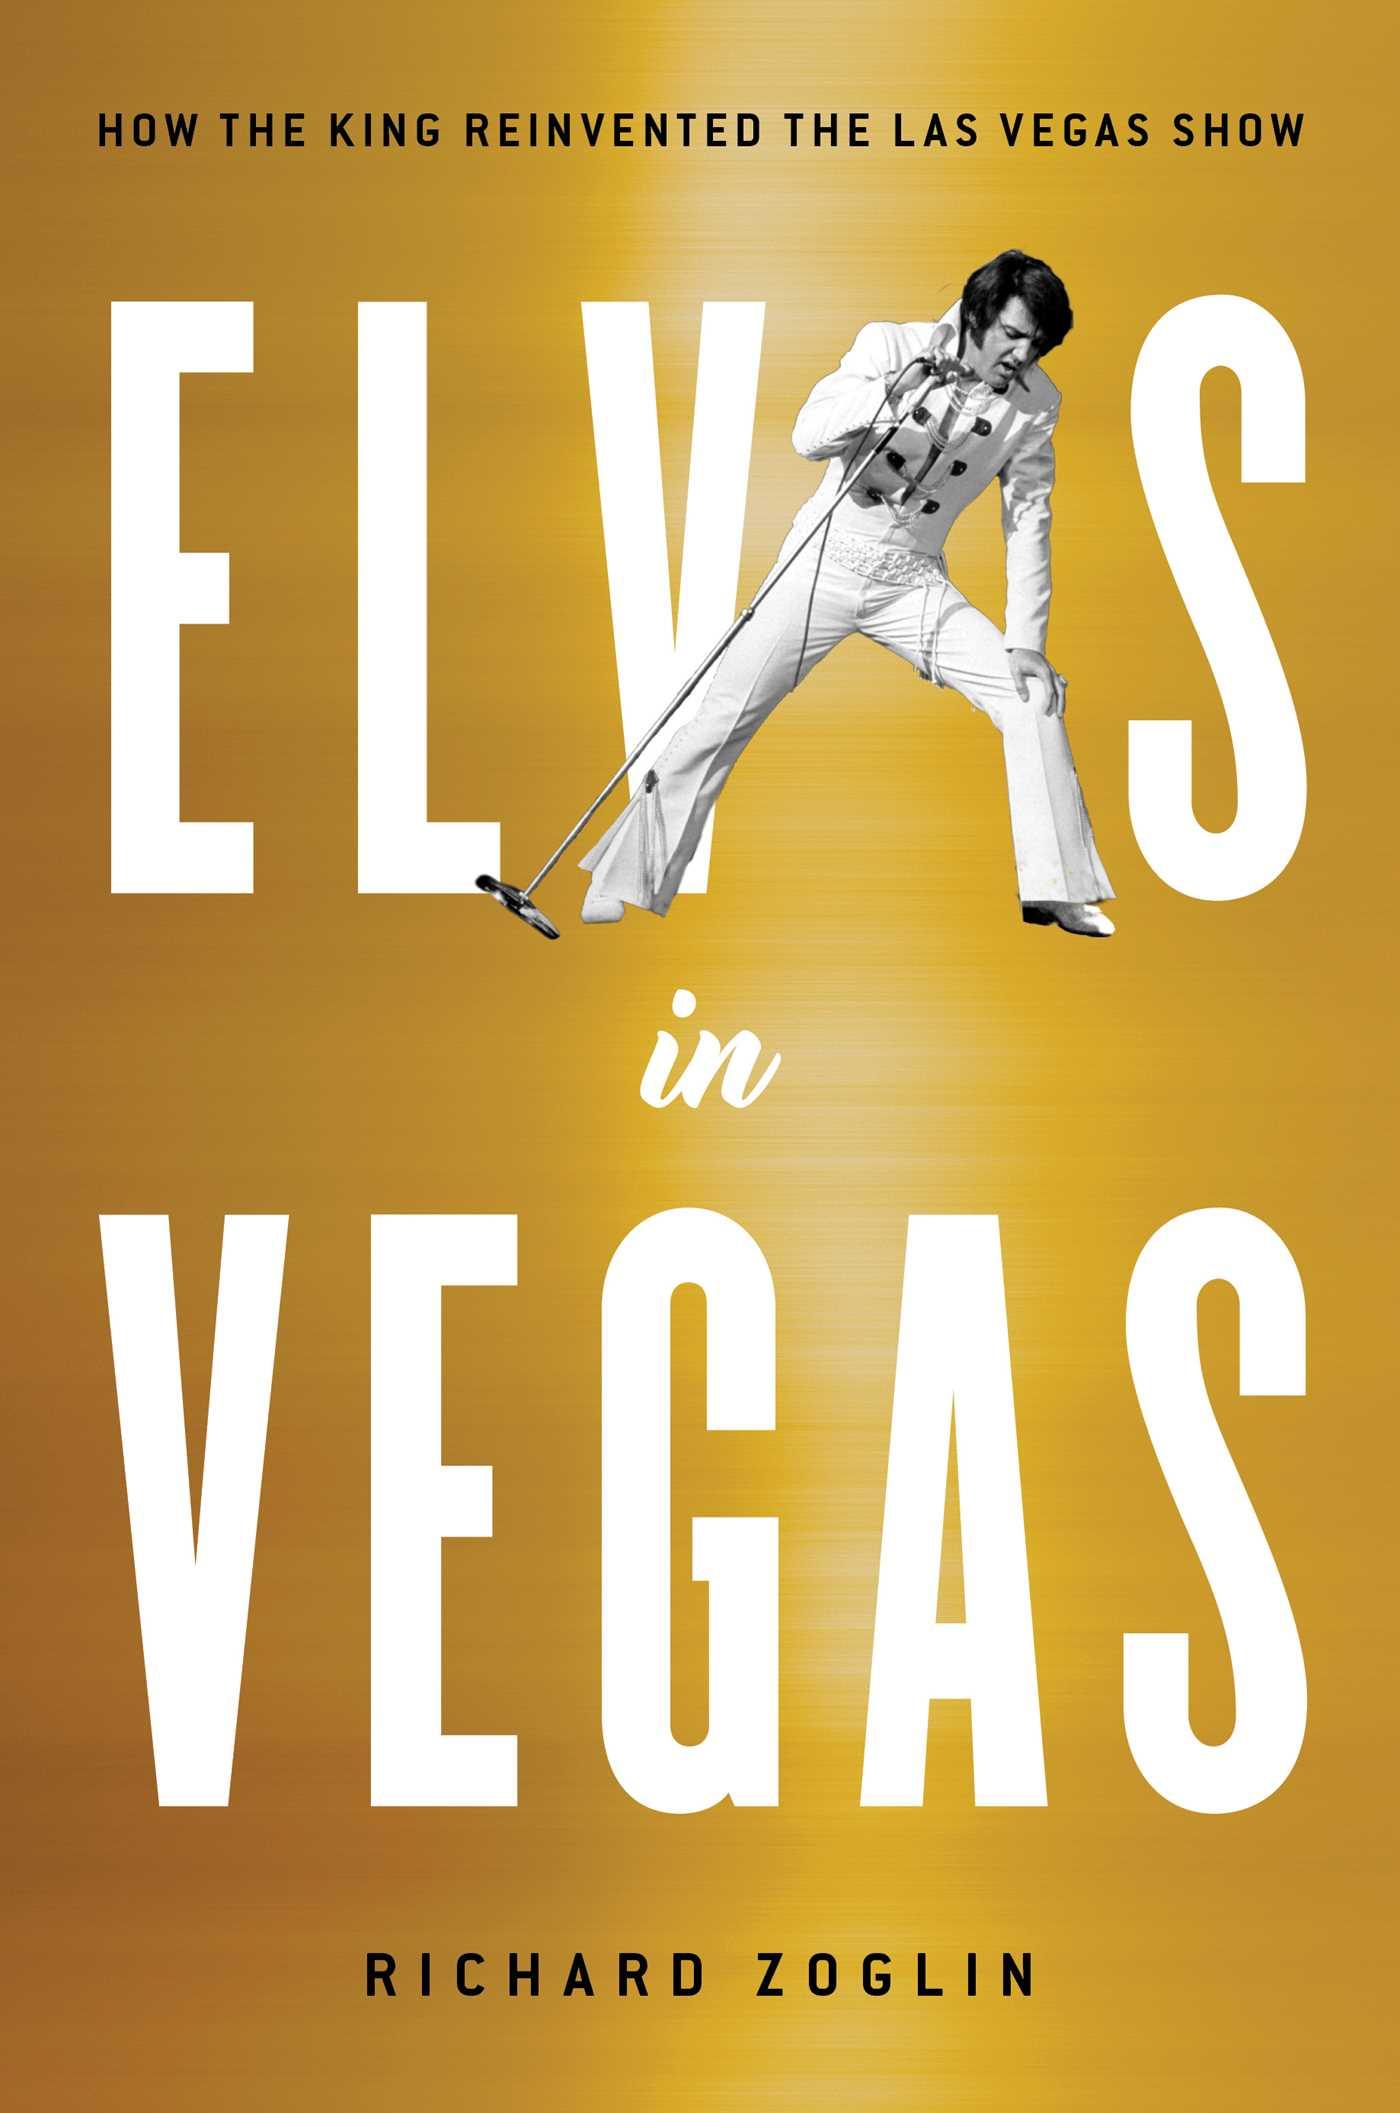 Elvis in Vegas   Book by Richard Zoglin   Official Publisher